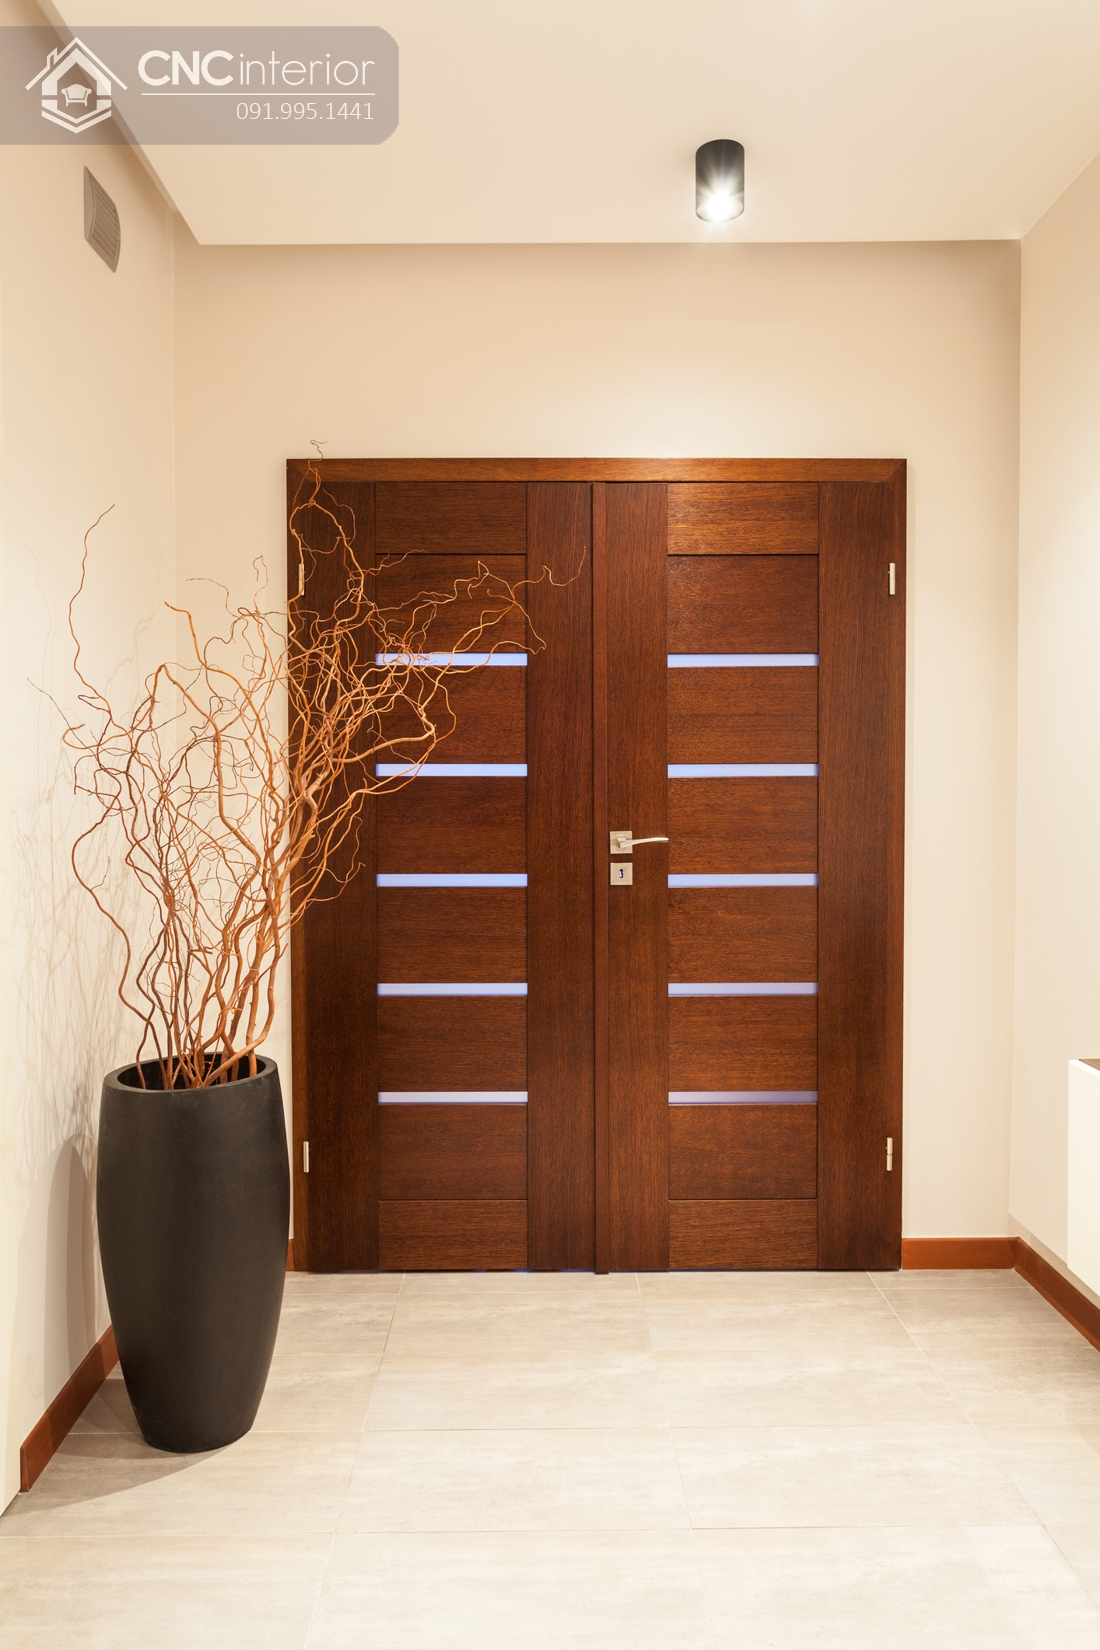 mẫu cửa gỗ 2 cánh lớn 5